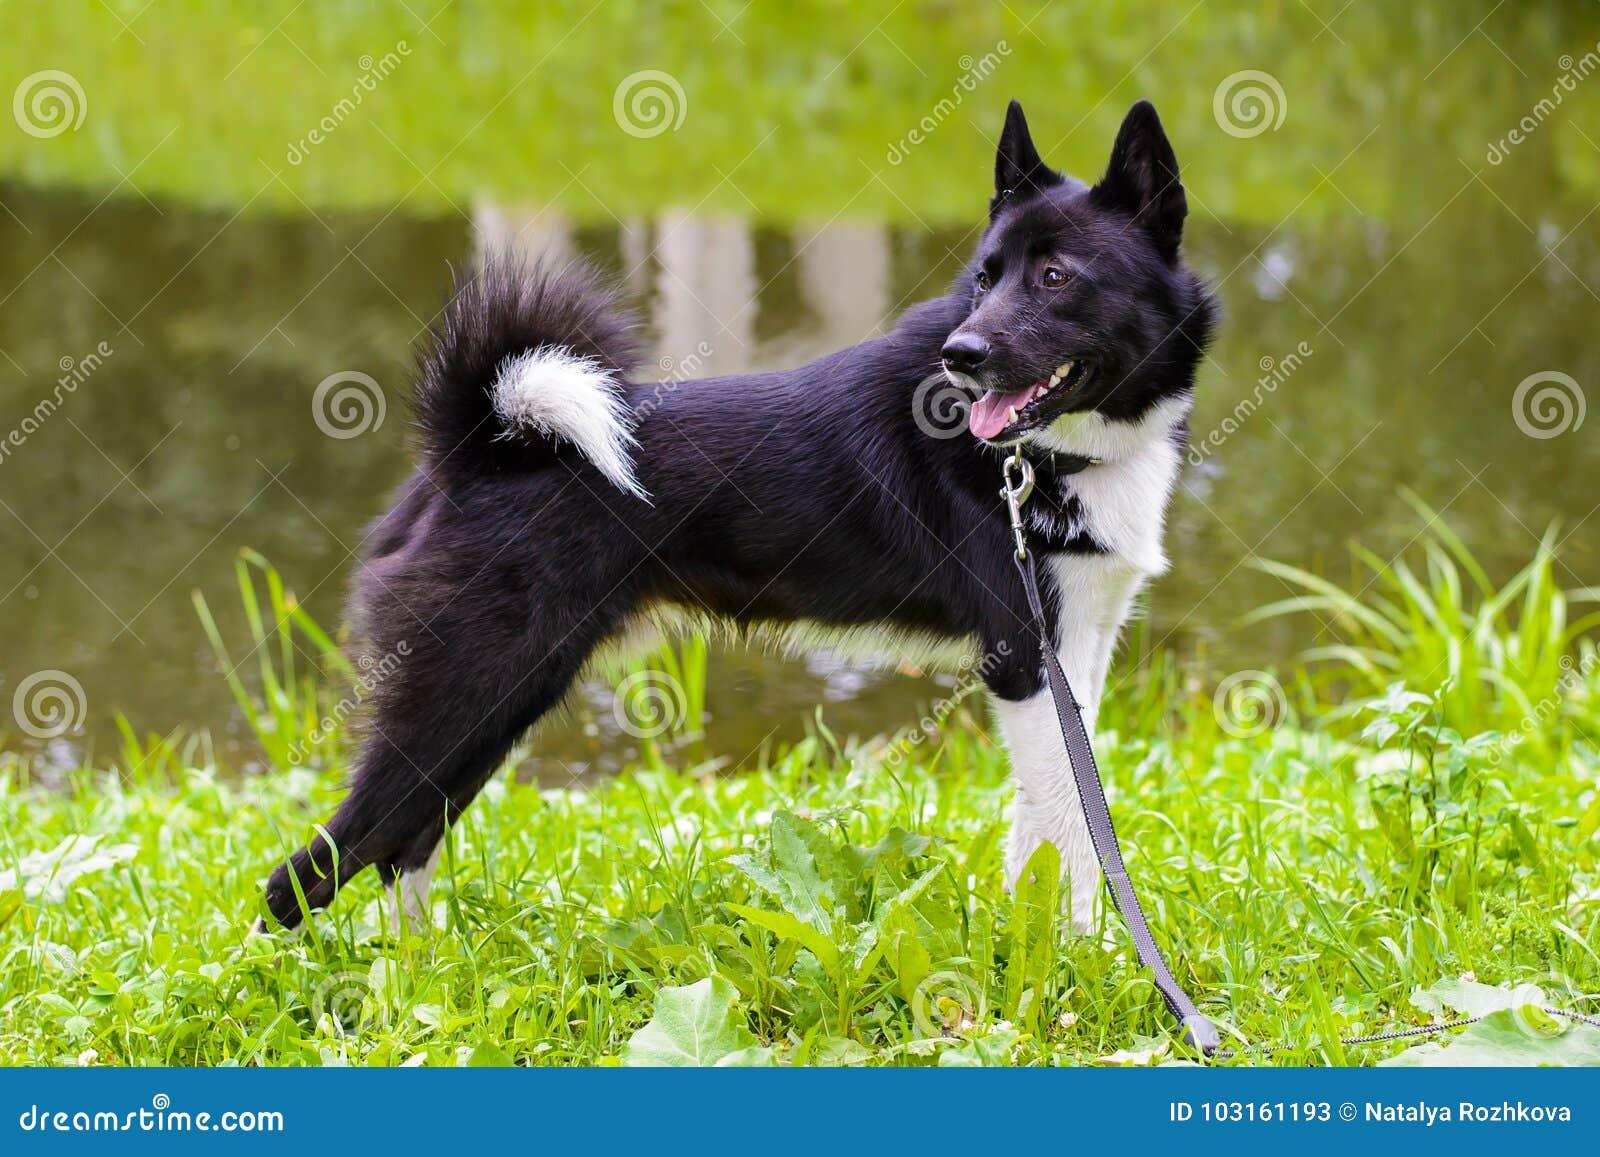 Husky standing on meadow.